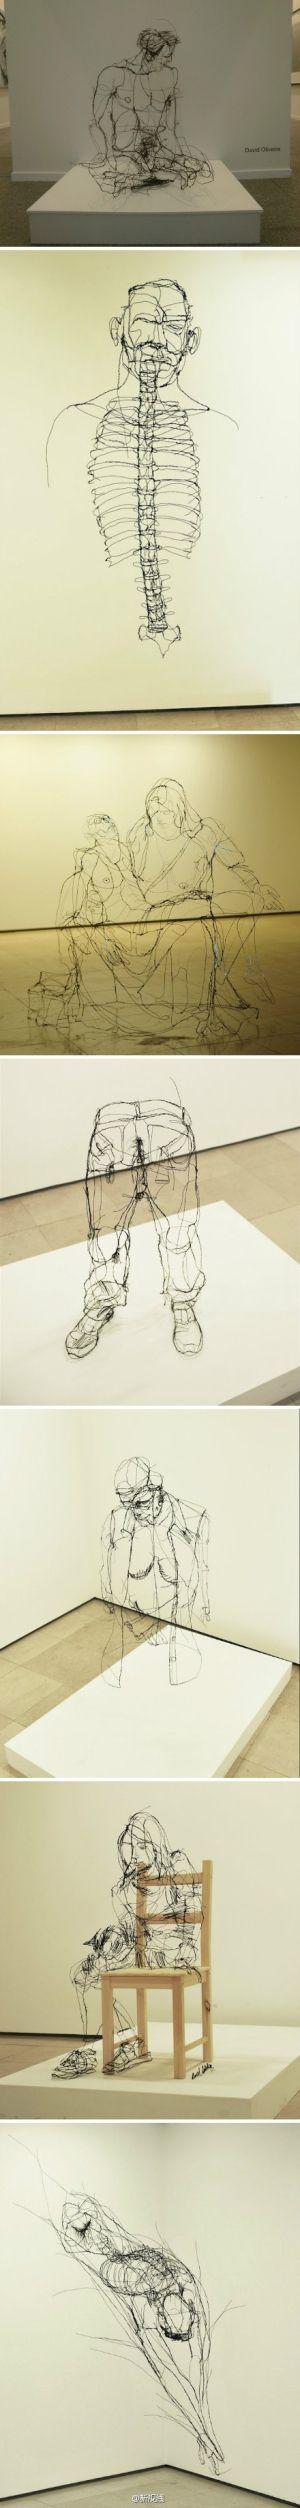 68 best wire sculpture images on Pinterest | Wire sculptures, Papier ...